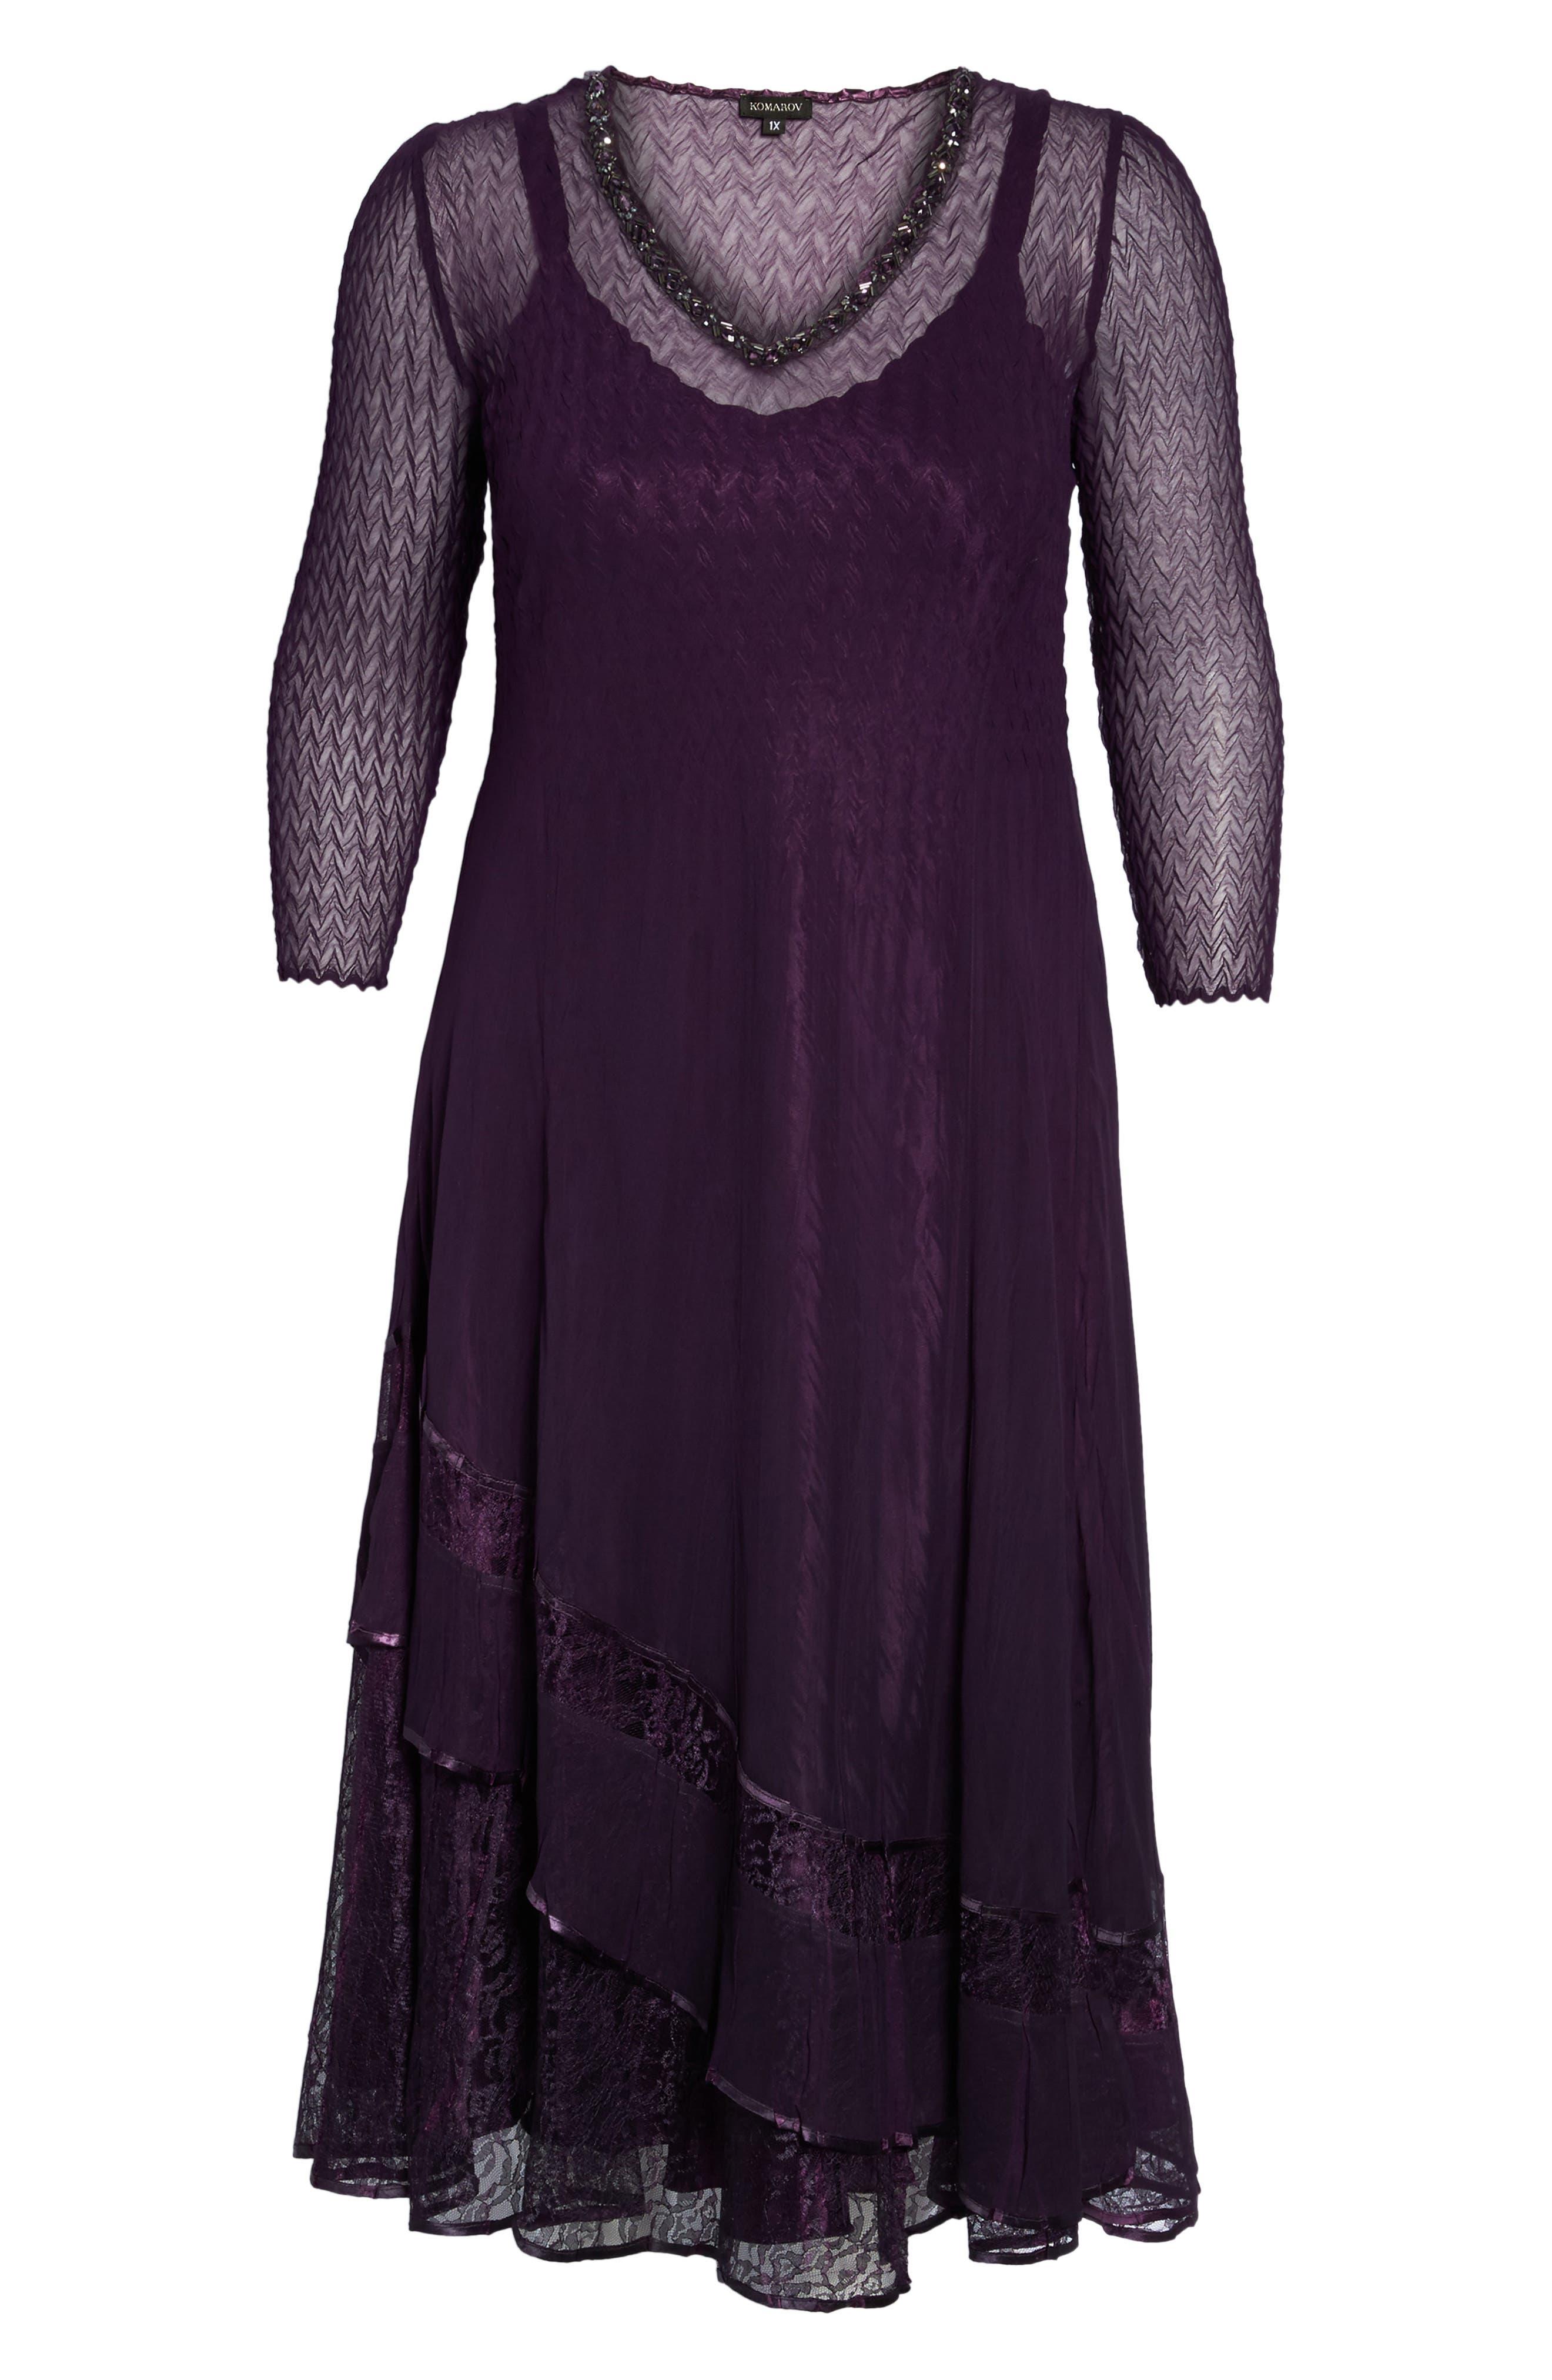 Chiffon Layer Charmeuse Dress,                             Alternate thumbnail 6, color,                             507